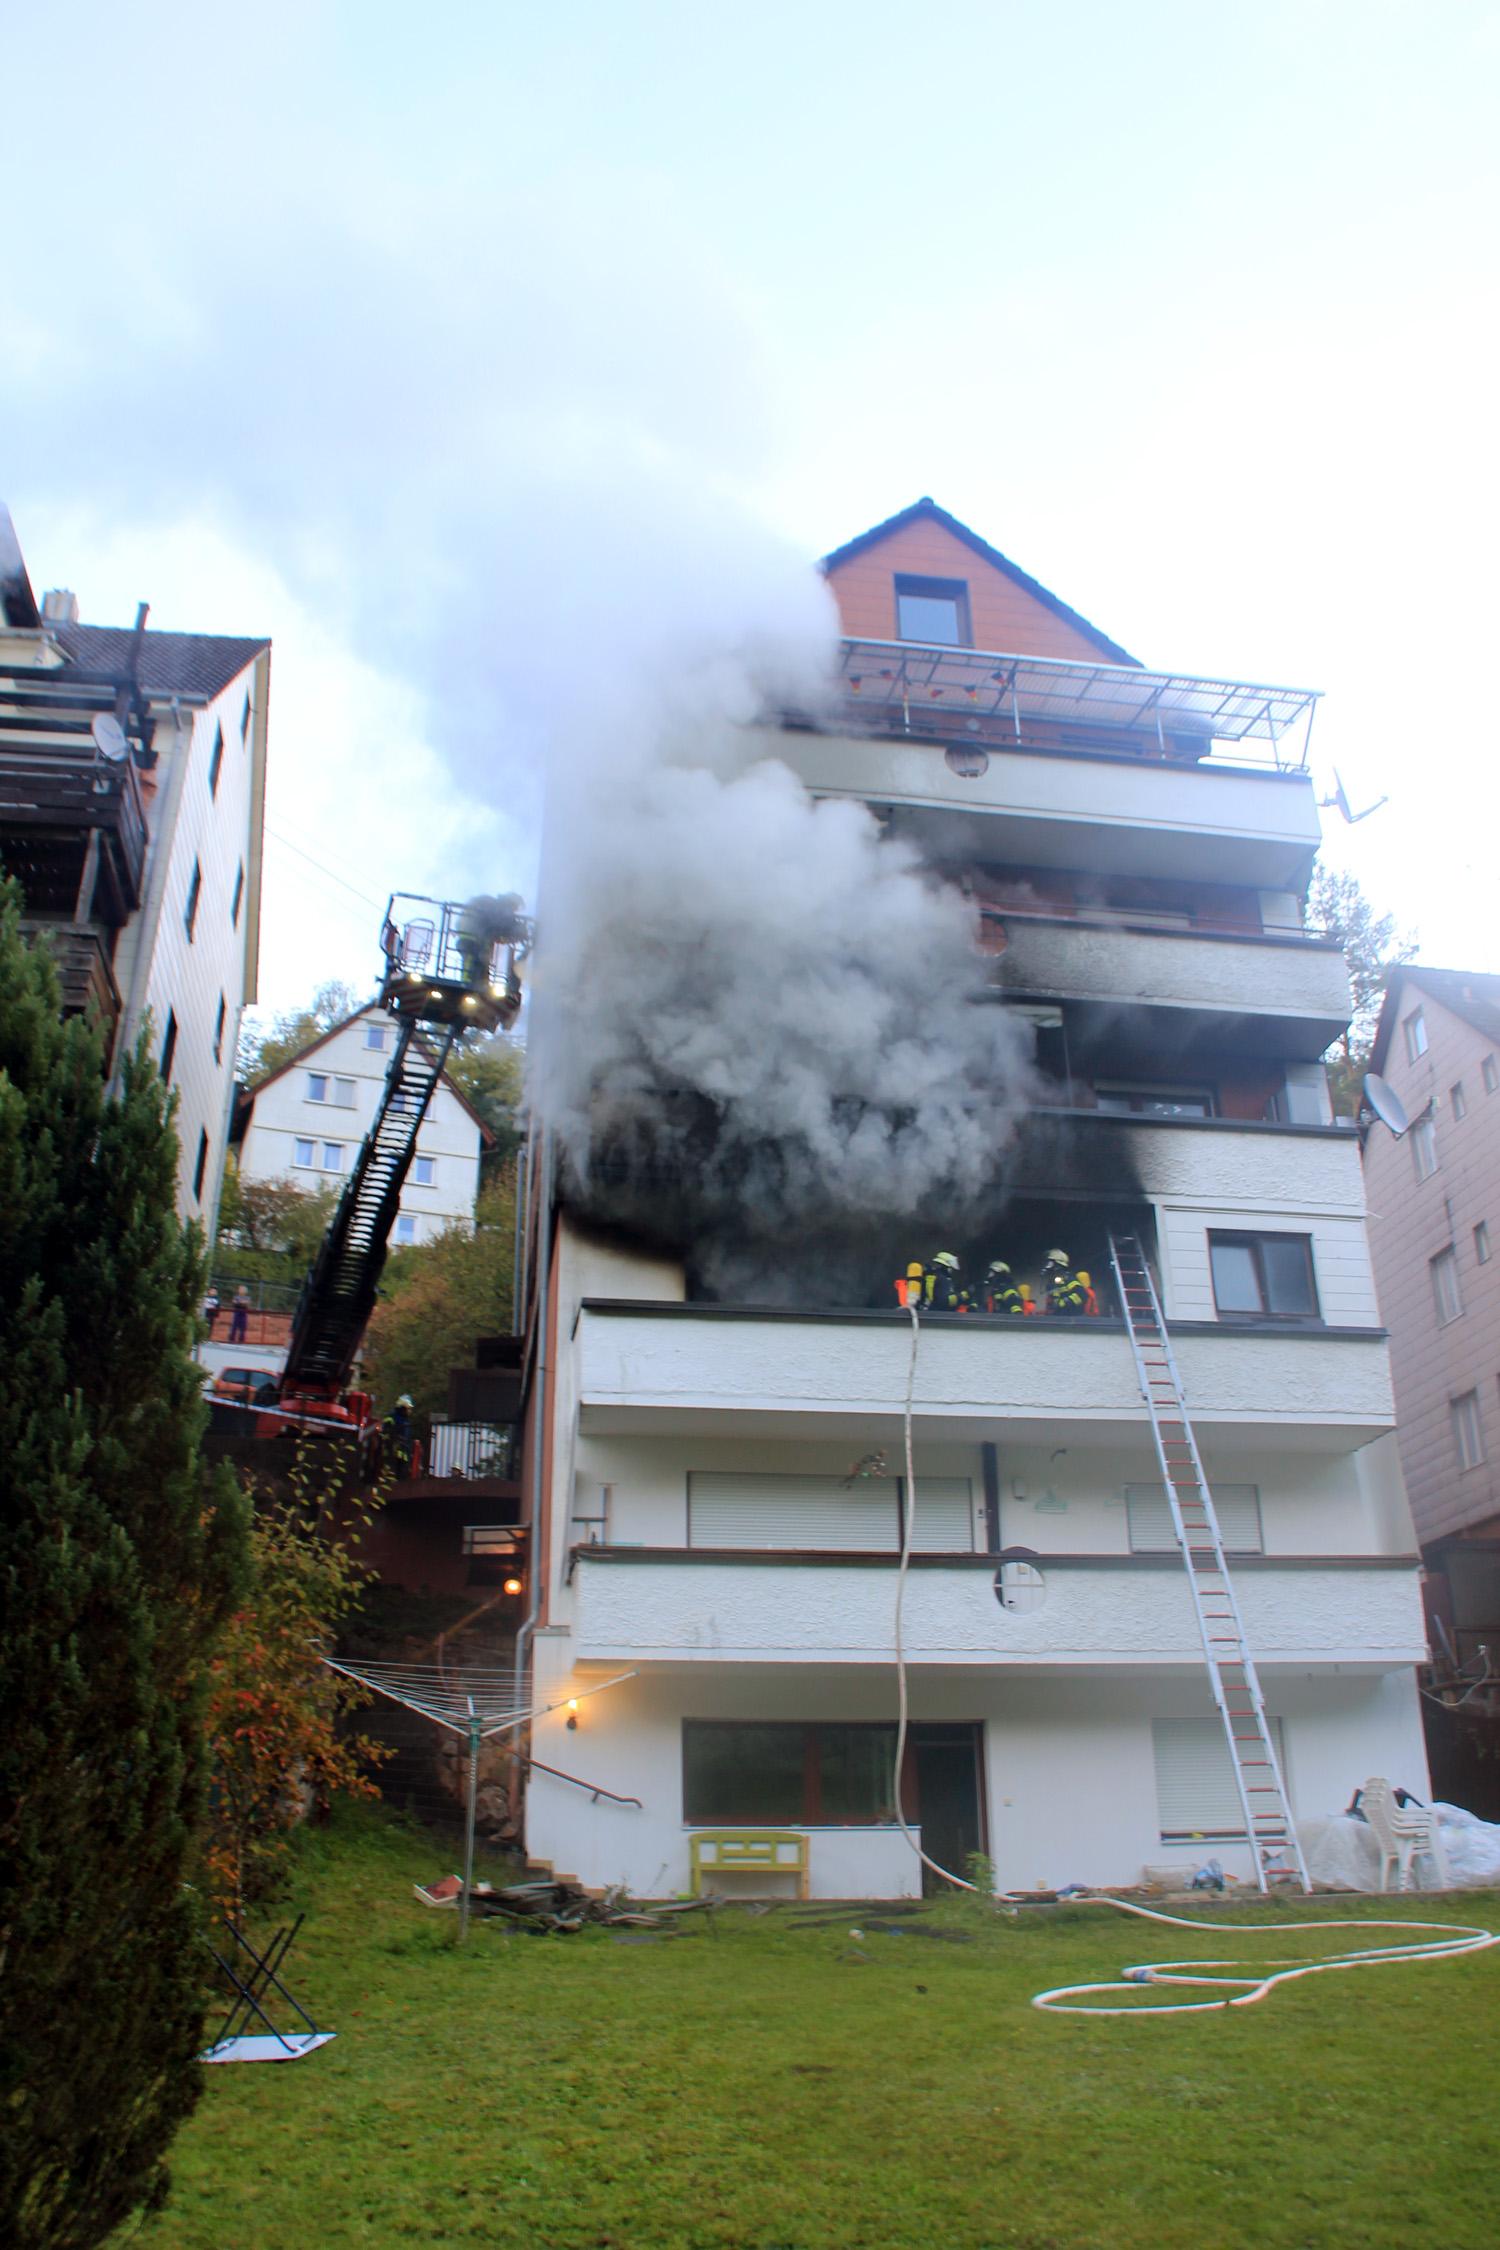 02.10.2018 - Wohnungsbrand